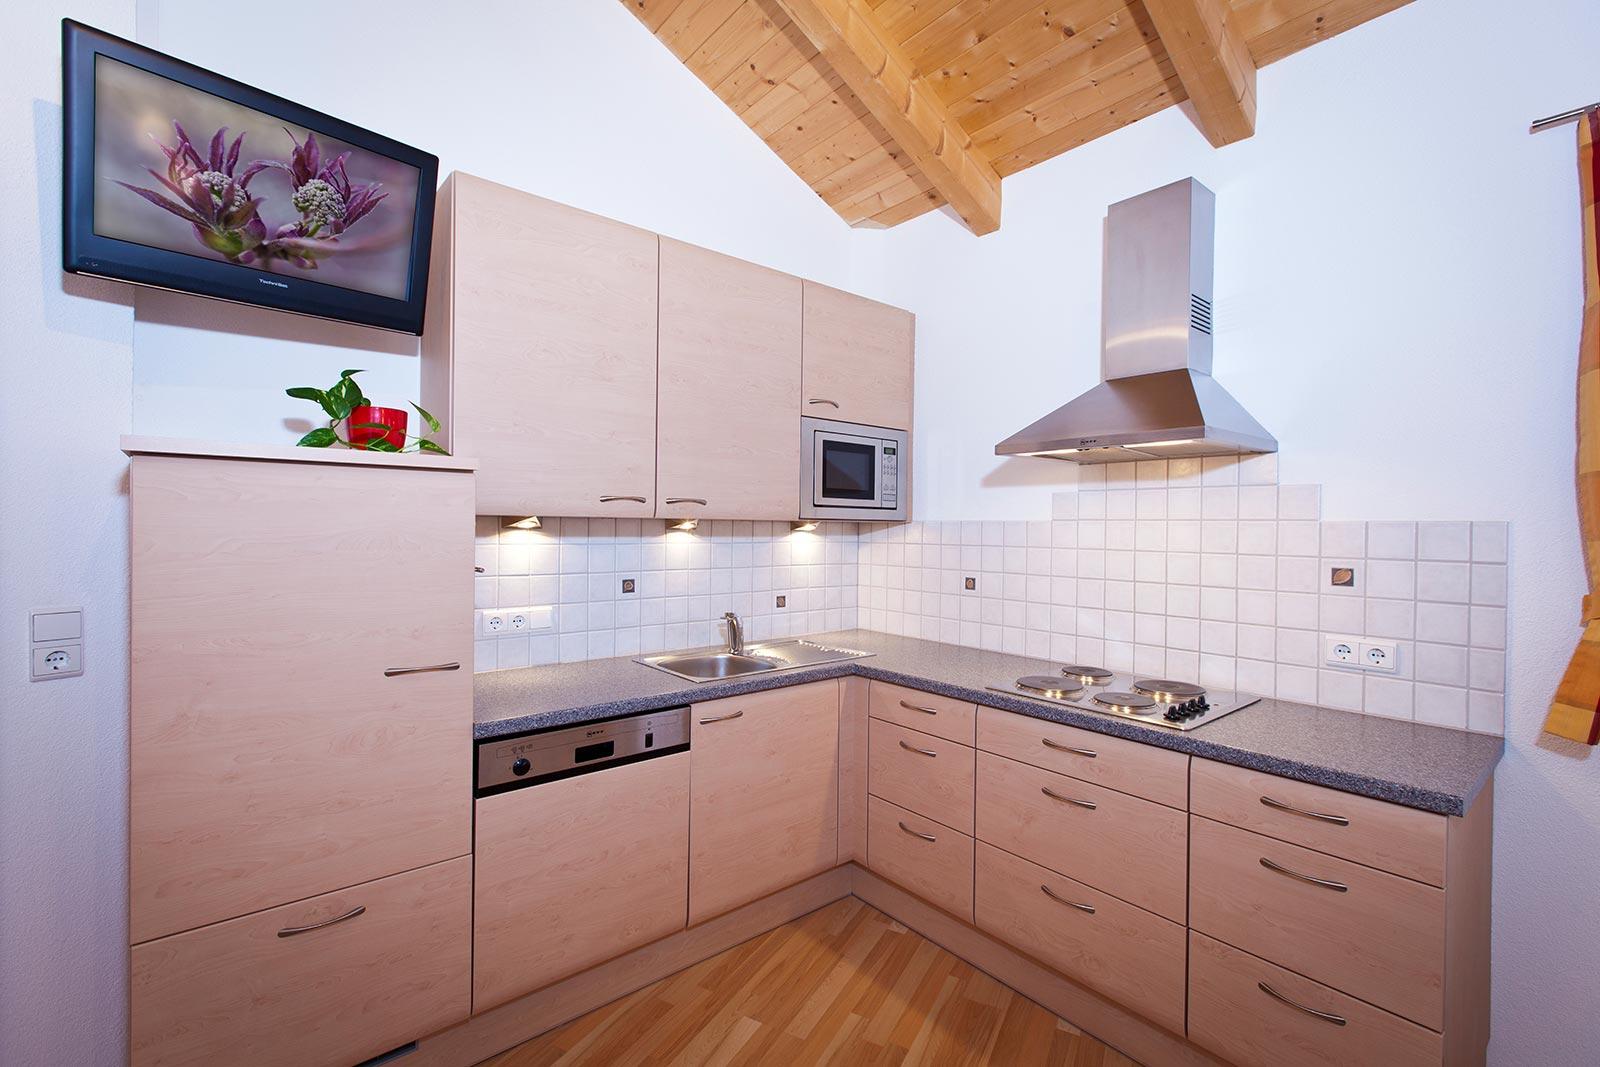 Appartements in unserem Haus Belvedere in Nauders